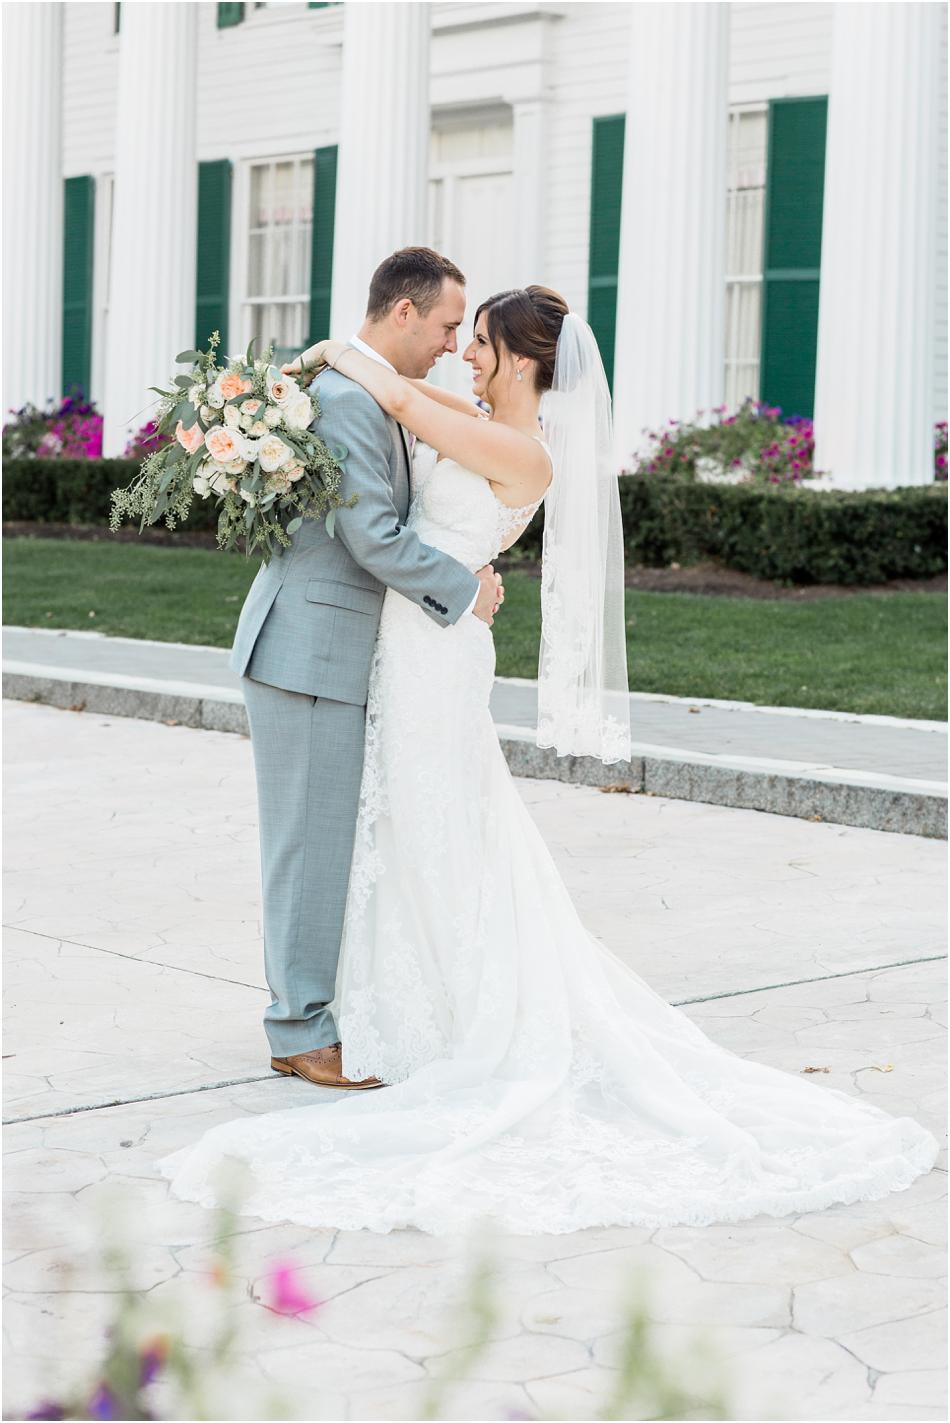 equinox_resort_golf_club_manchester_vermont_jennifer_matt_cape_cod_boston_new_england_wedding_photographer_Meredith_Jane_Photography_photo_2382.jpg